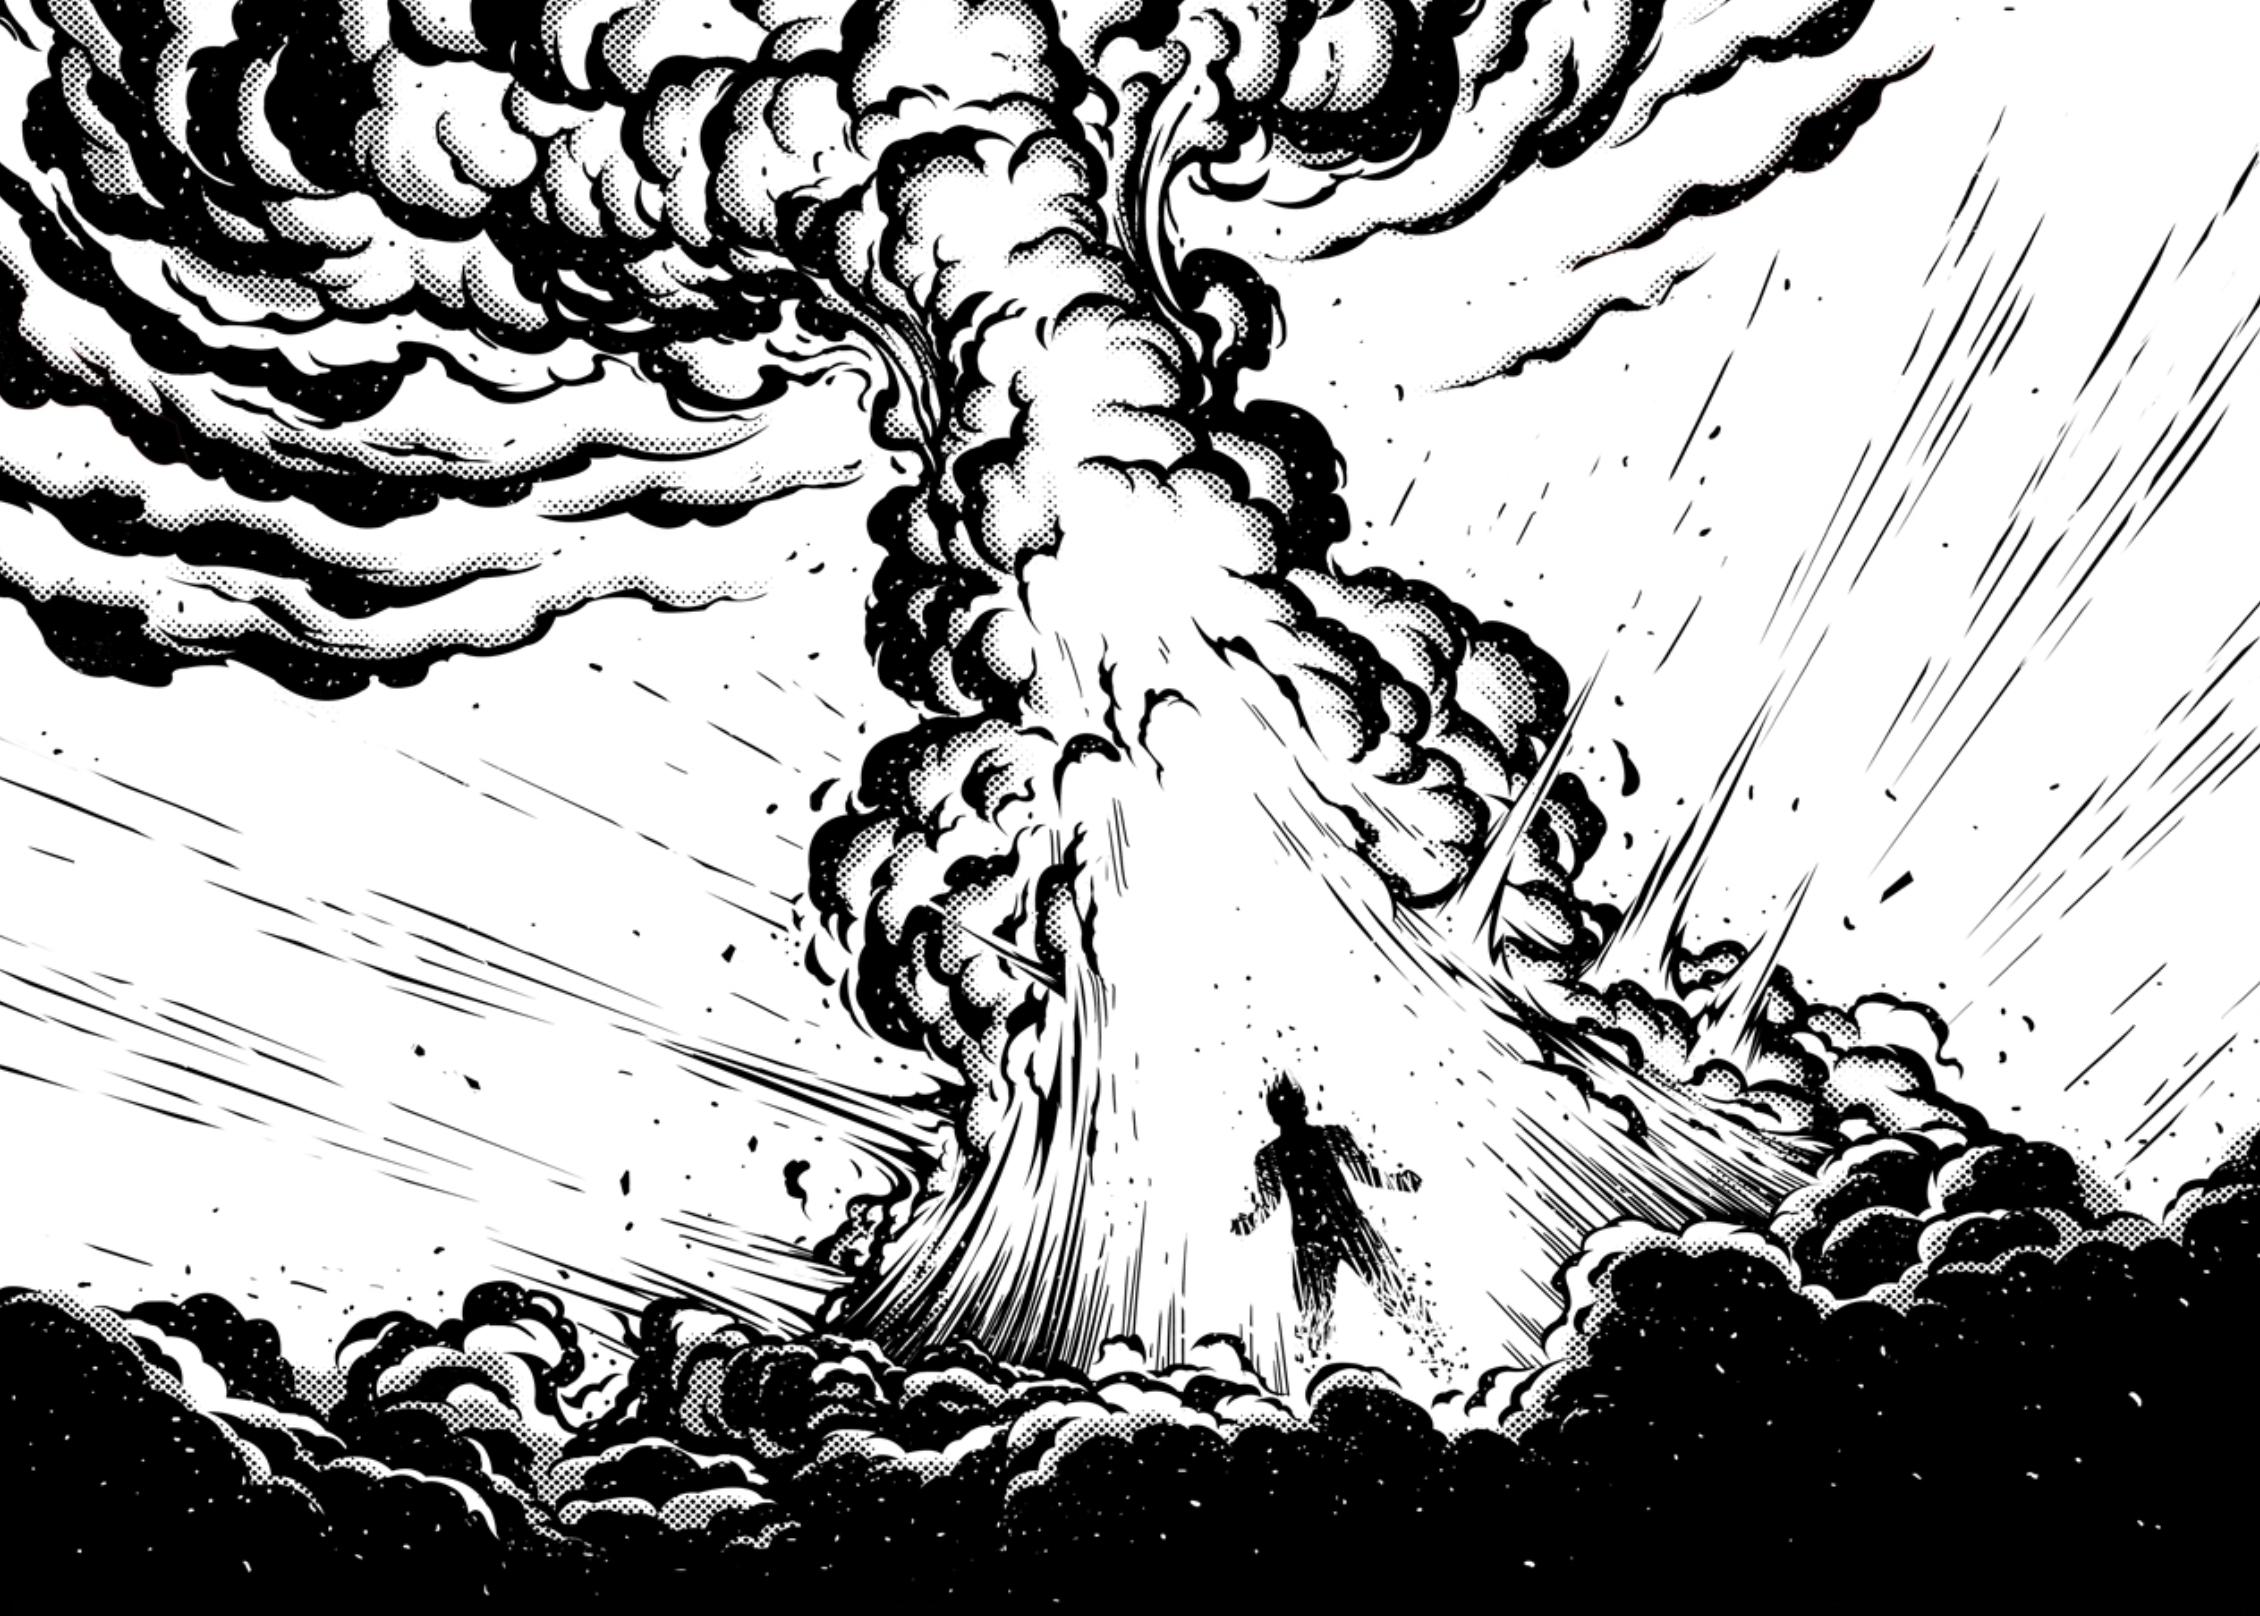 Surrealism 2 winner - Explosion